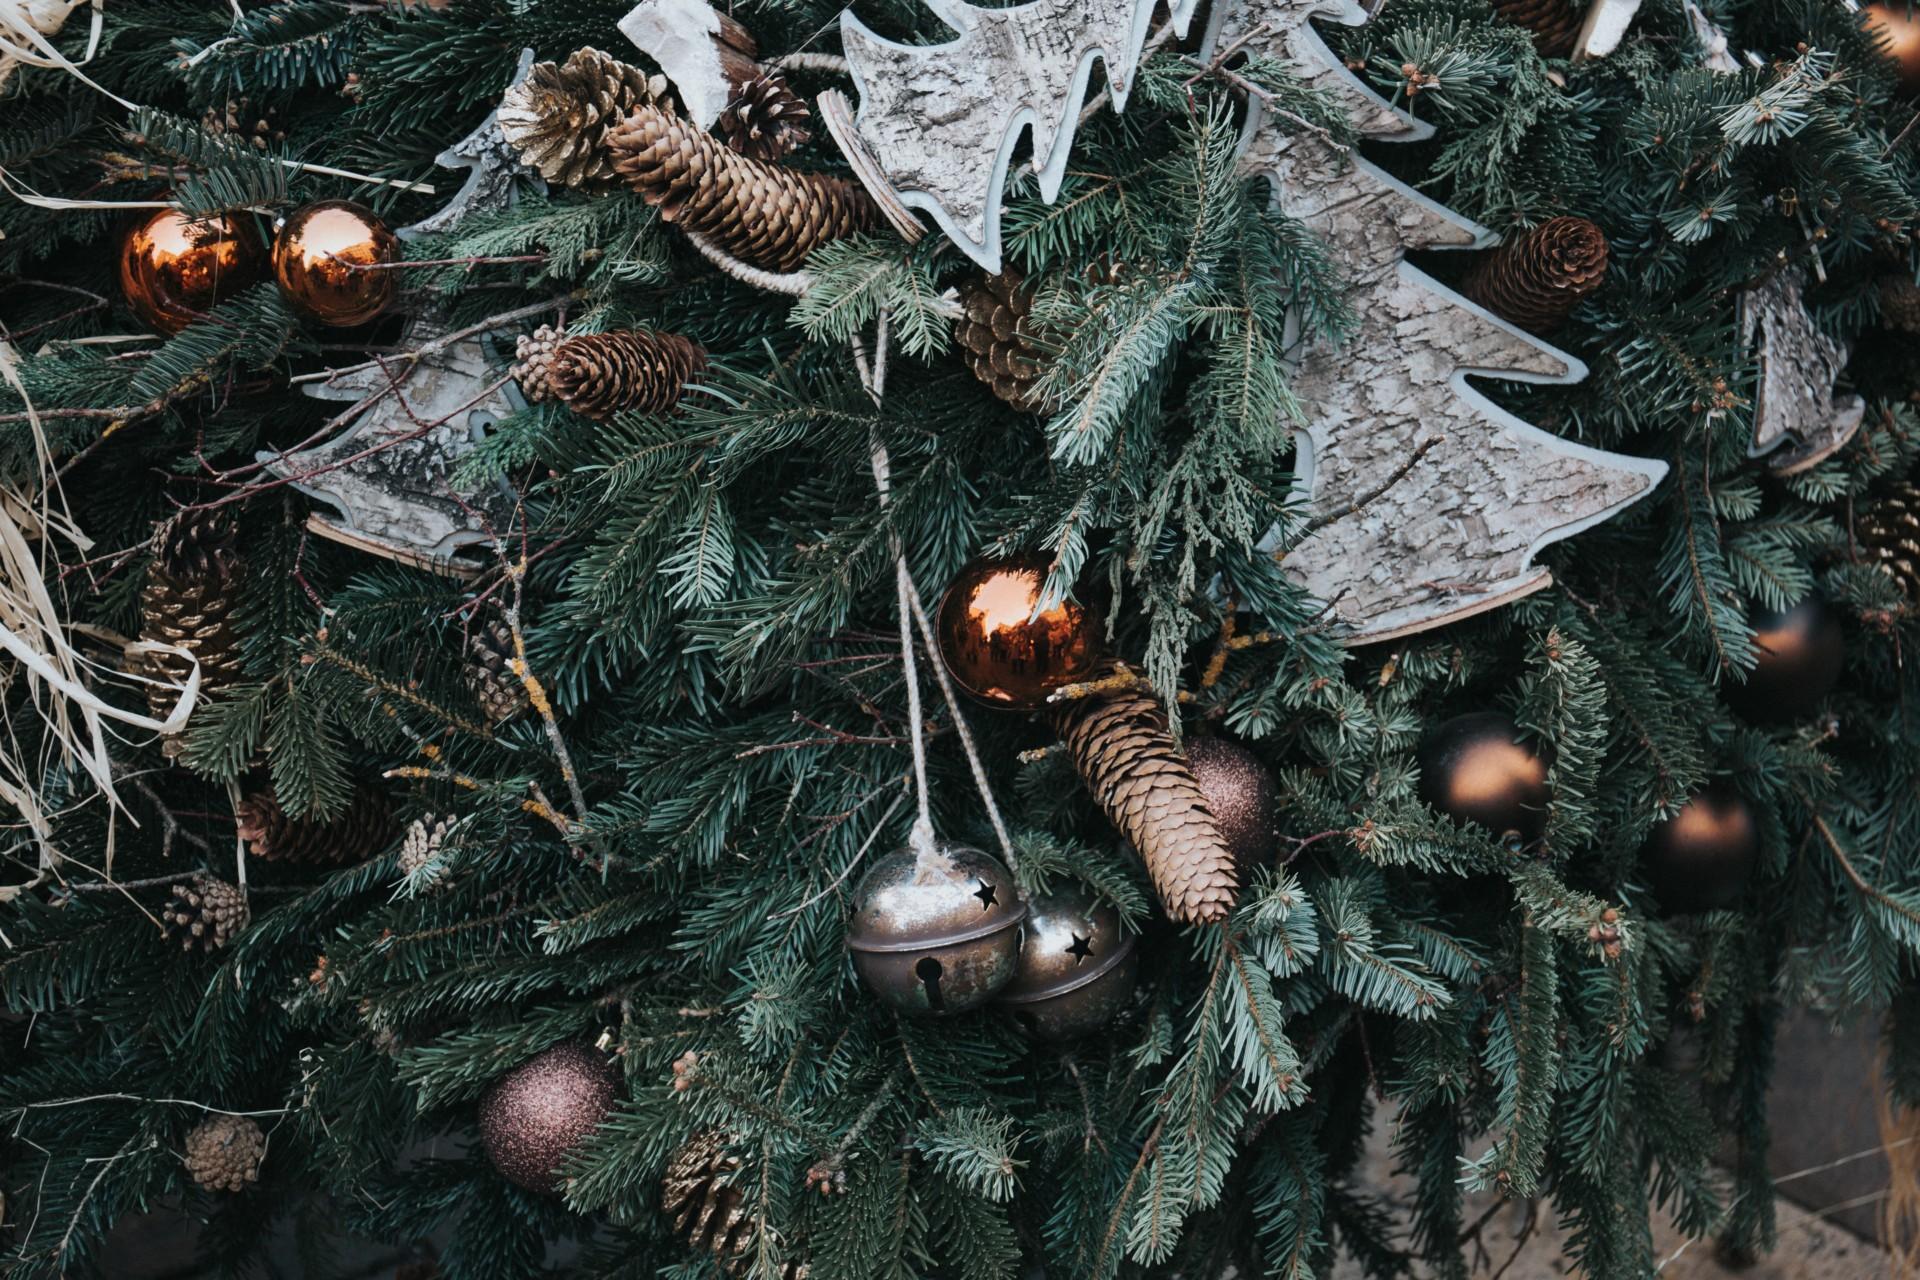 Chrismas tree and decorations